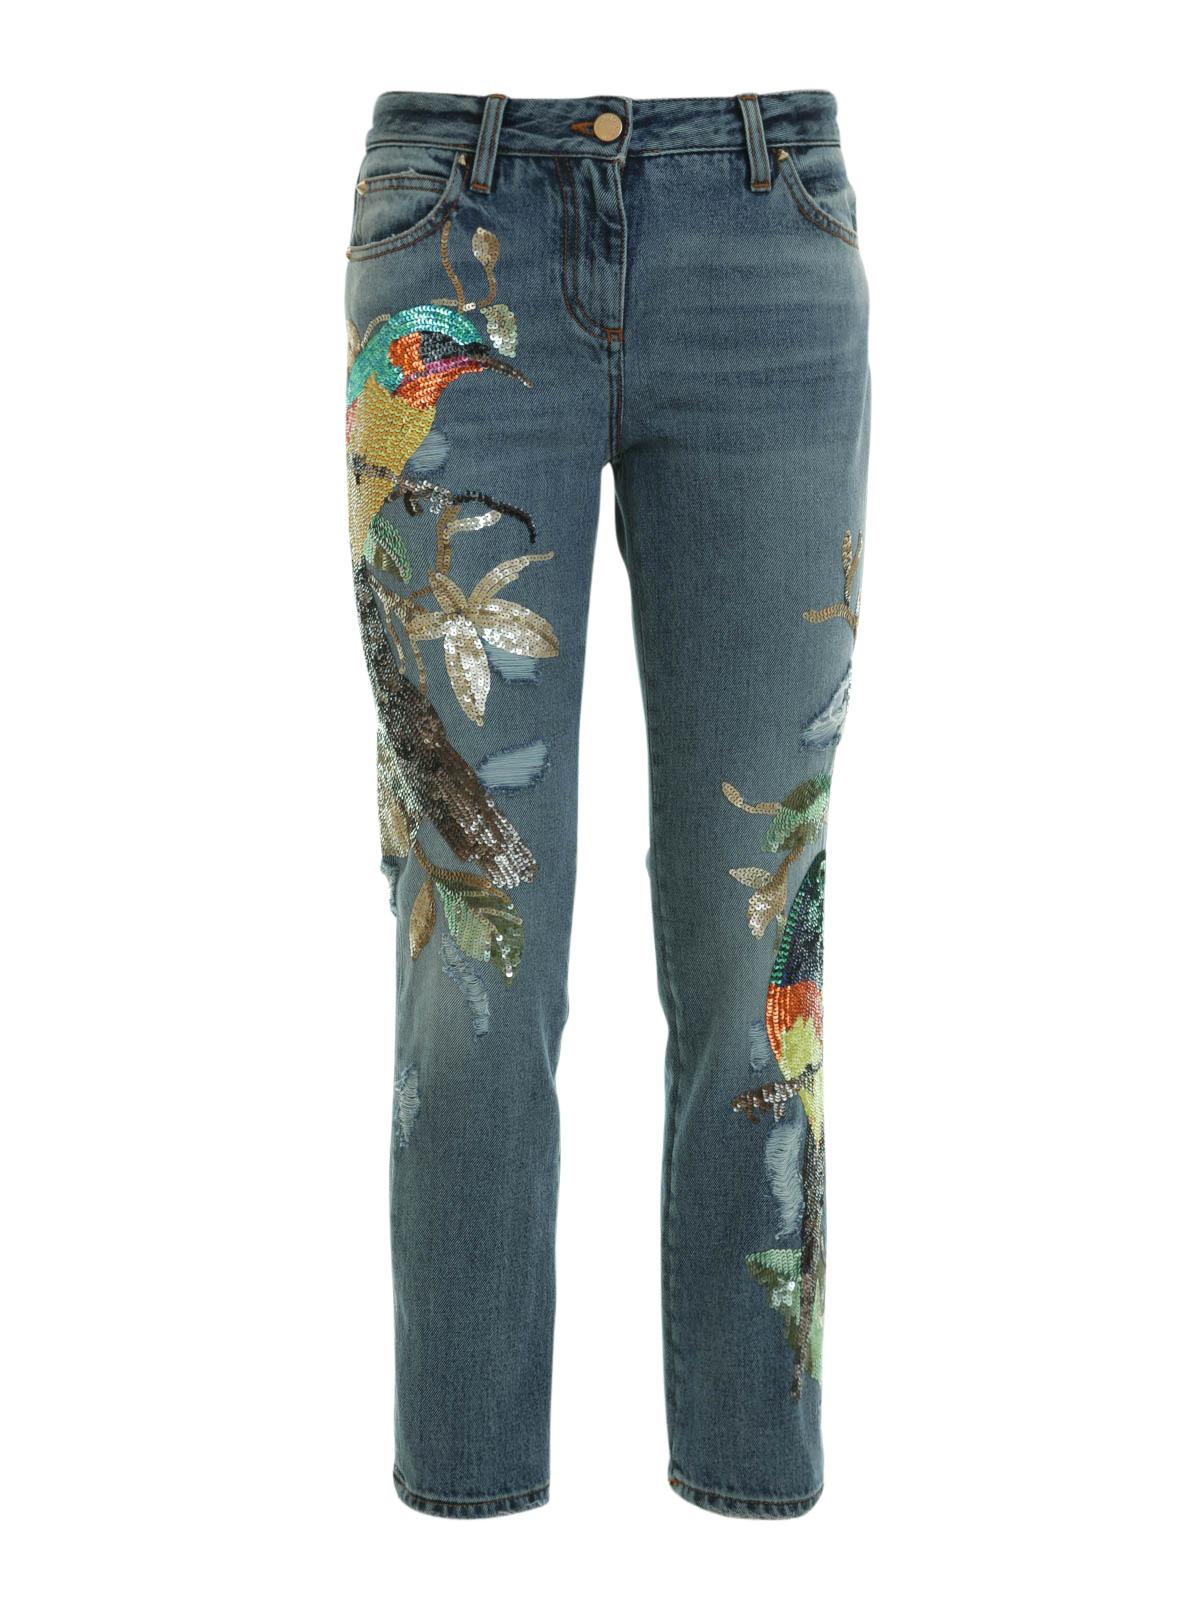 Embroidered capri jeans by roberto cavalli straight leg